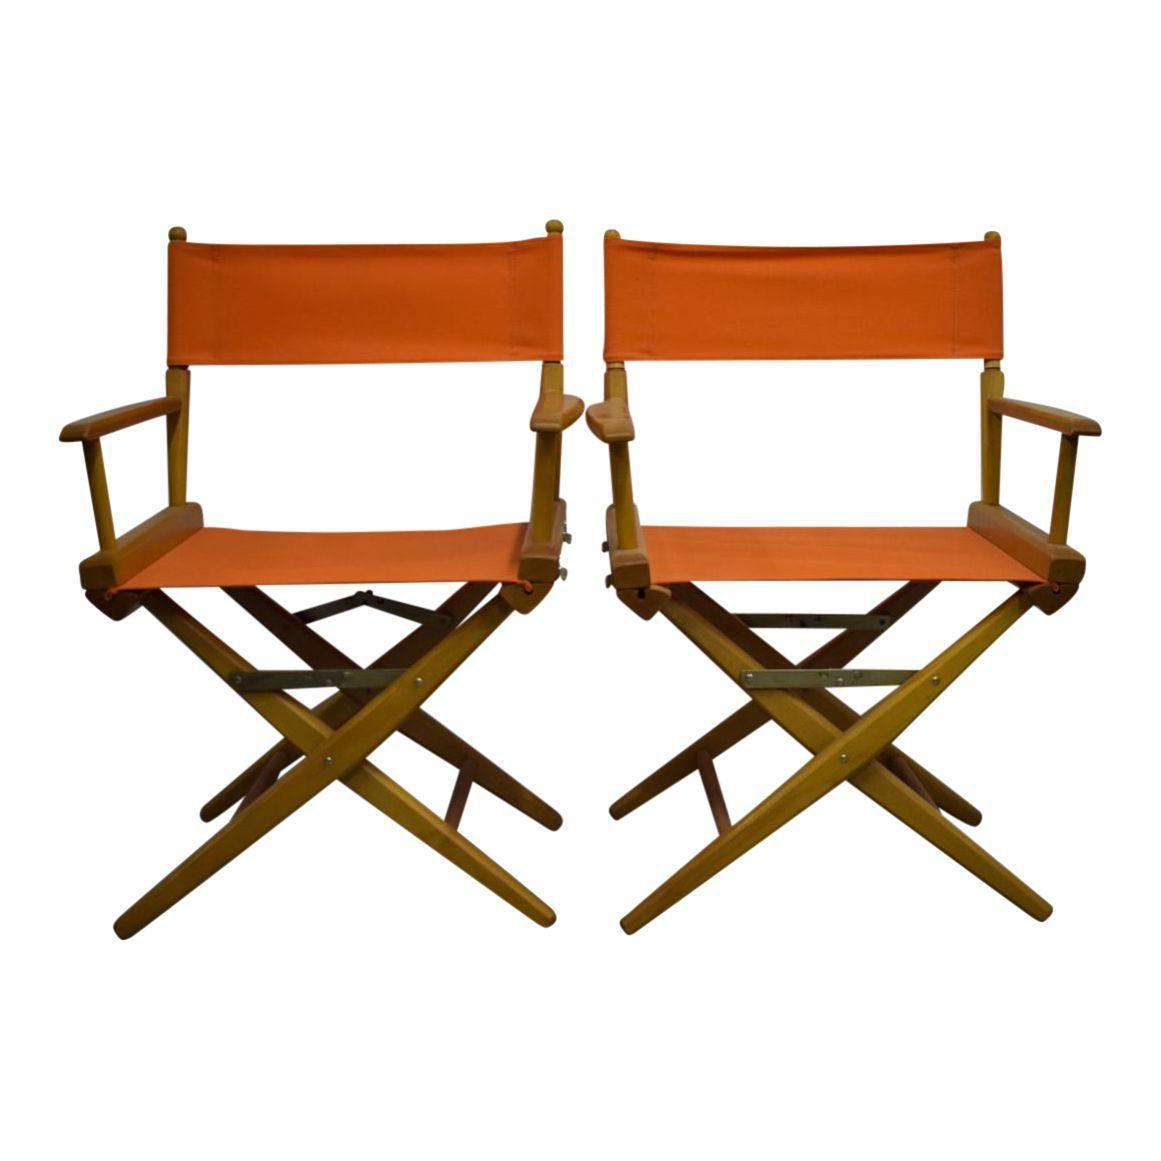 Hermes Orange Canvas Director S Chairs A Pair Lofts # Penguin Lodge Muebles